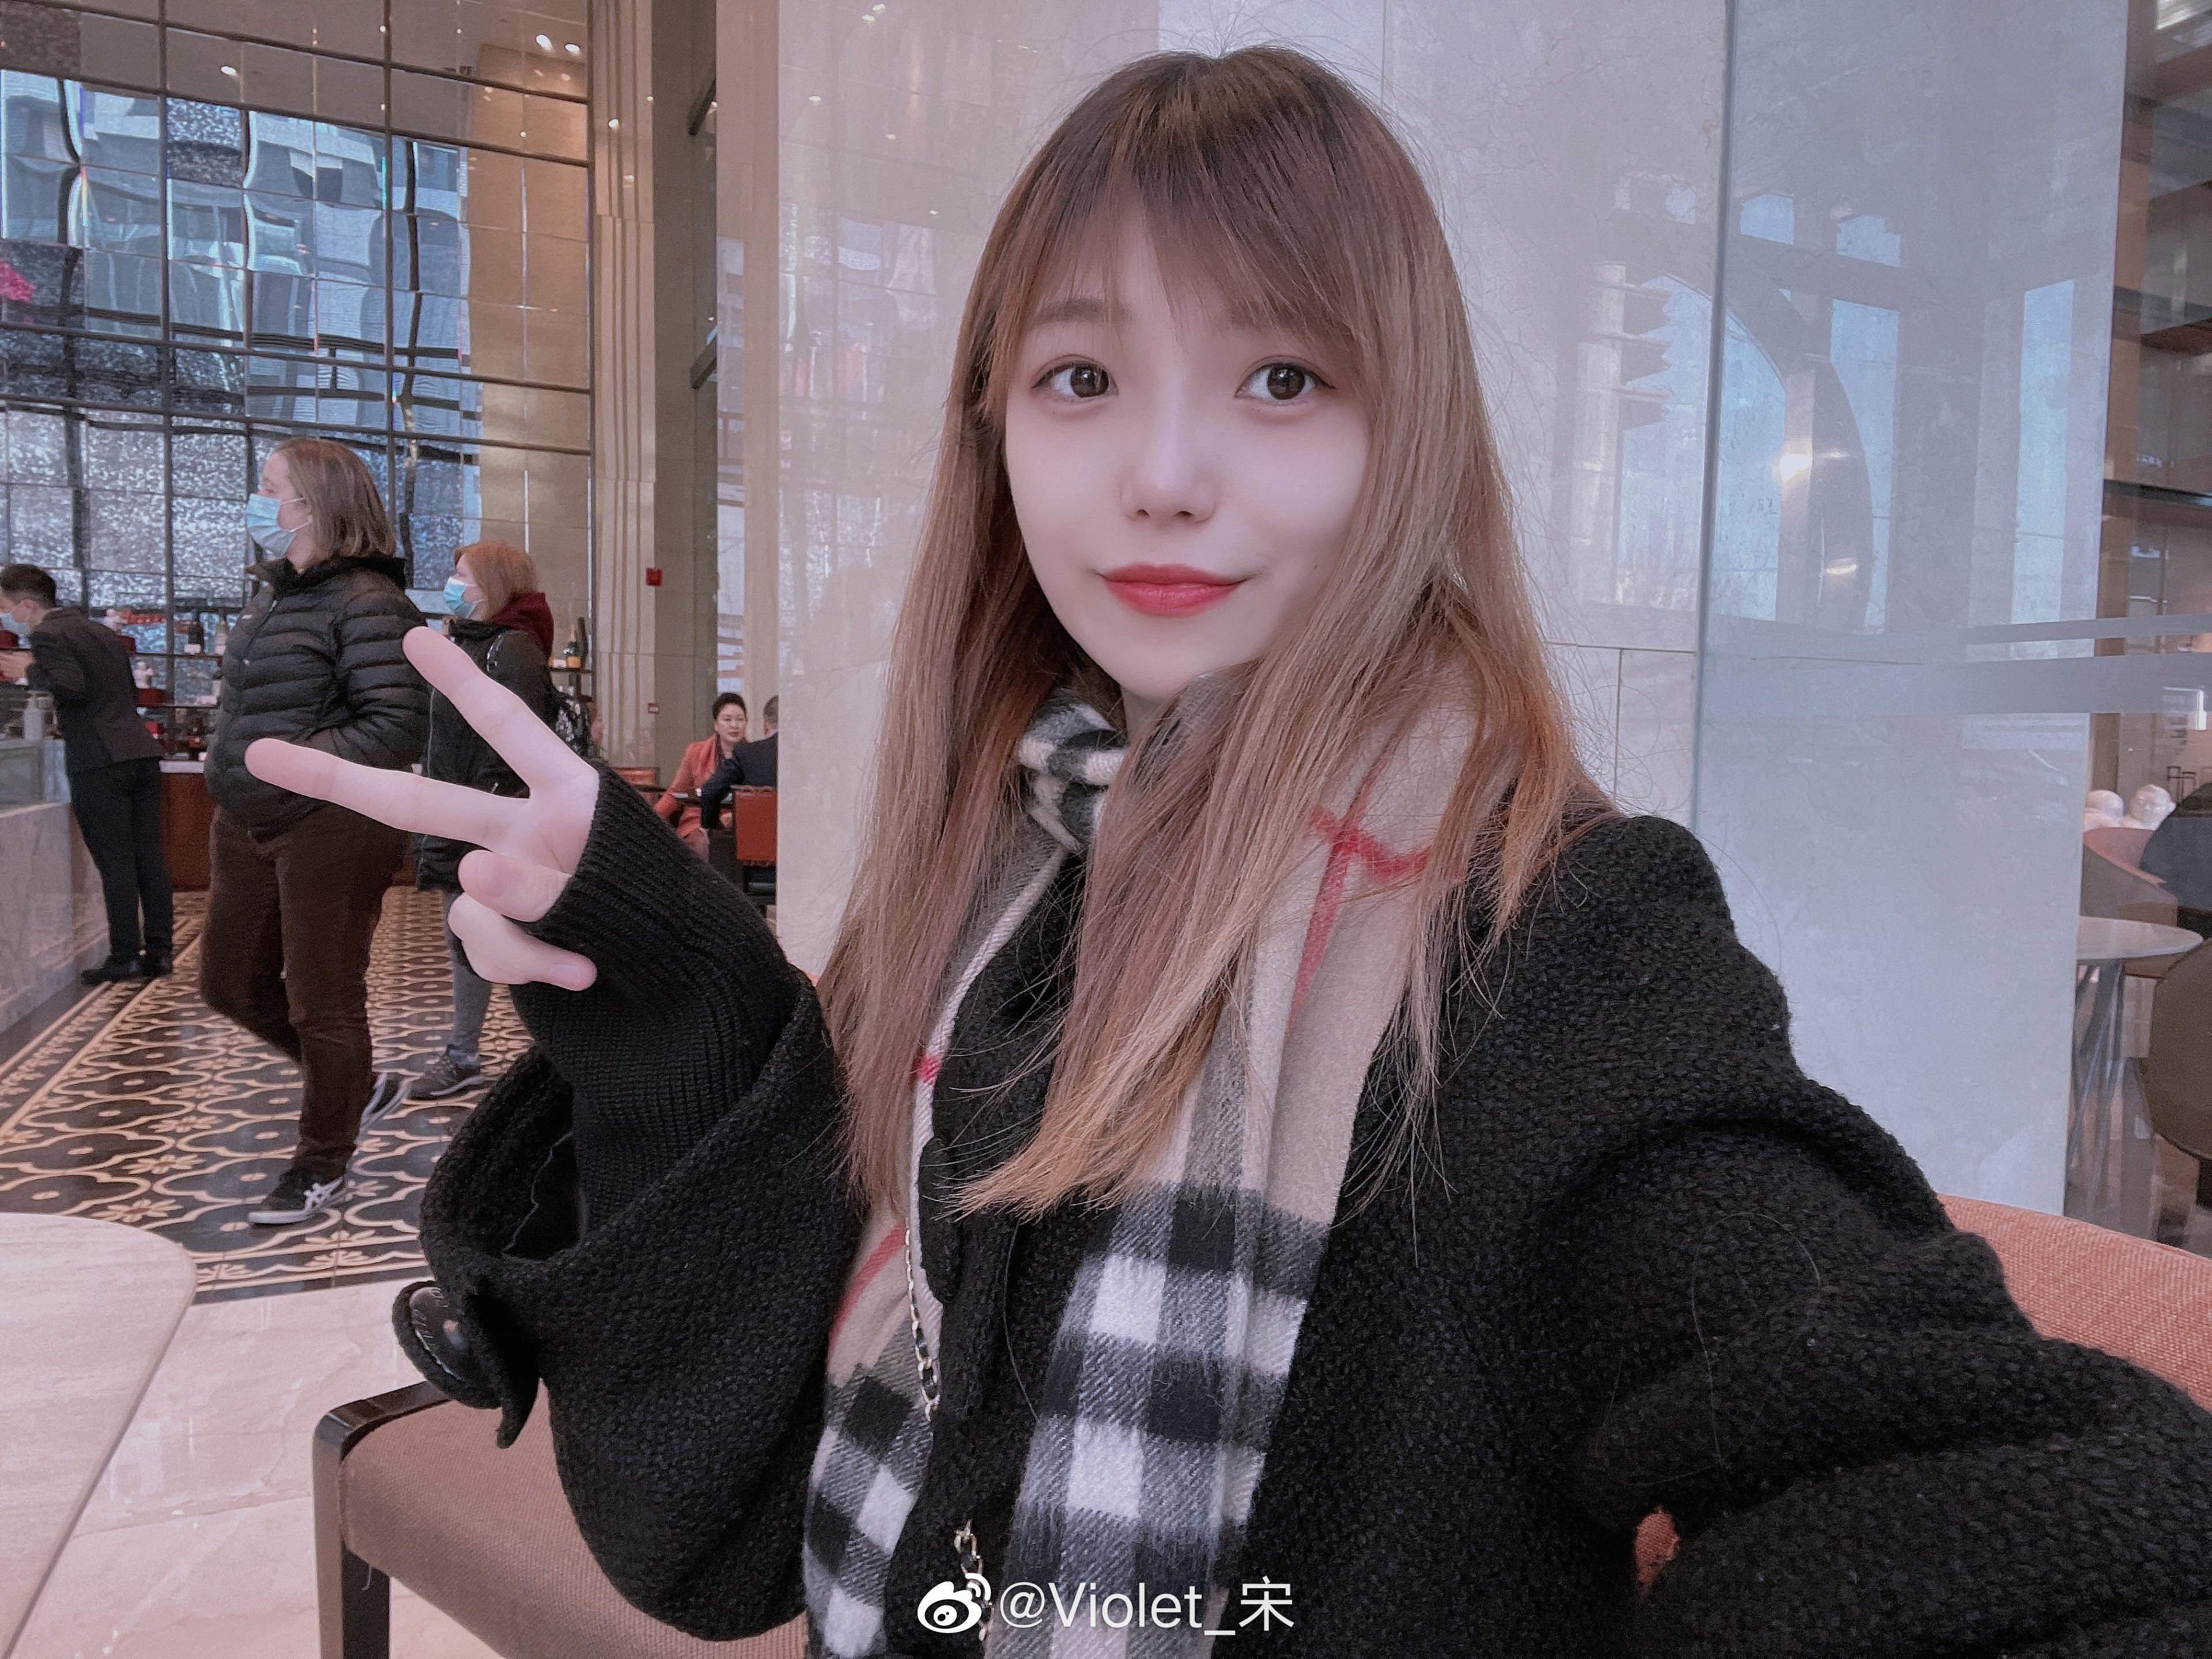 宋紫薇_202101121557_004